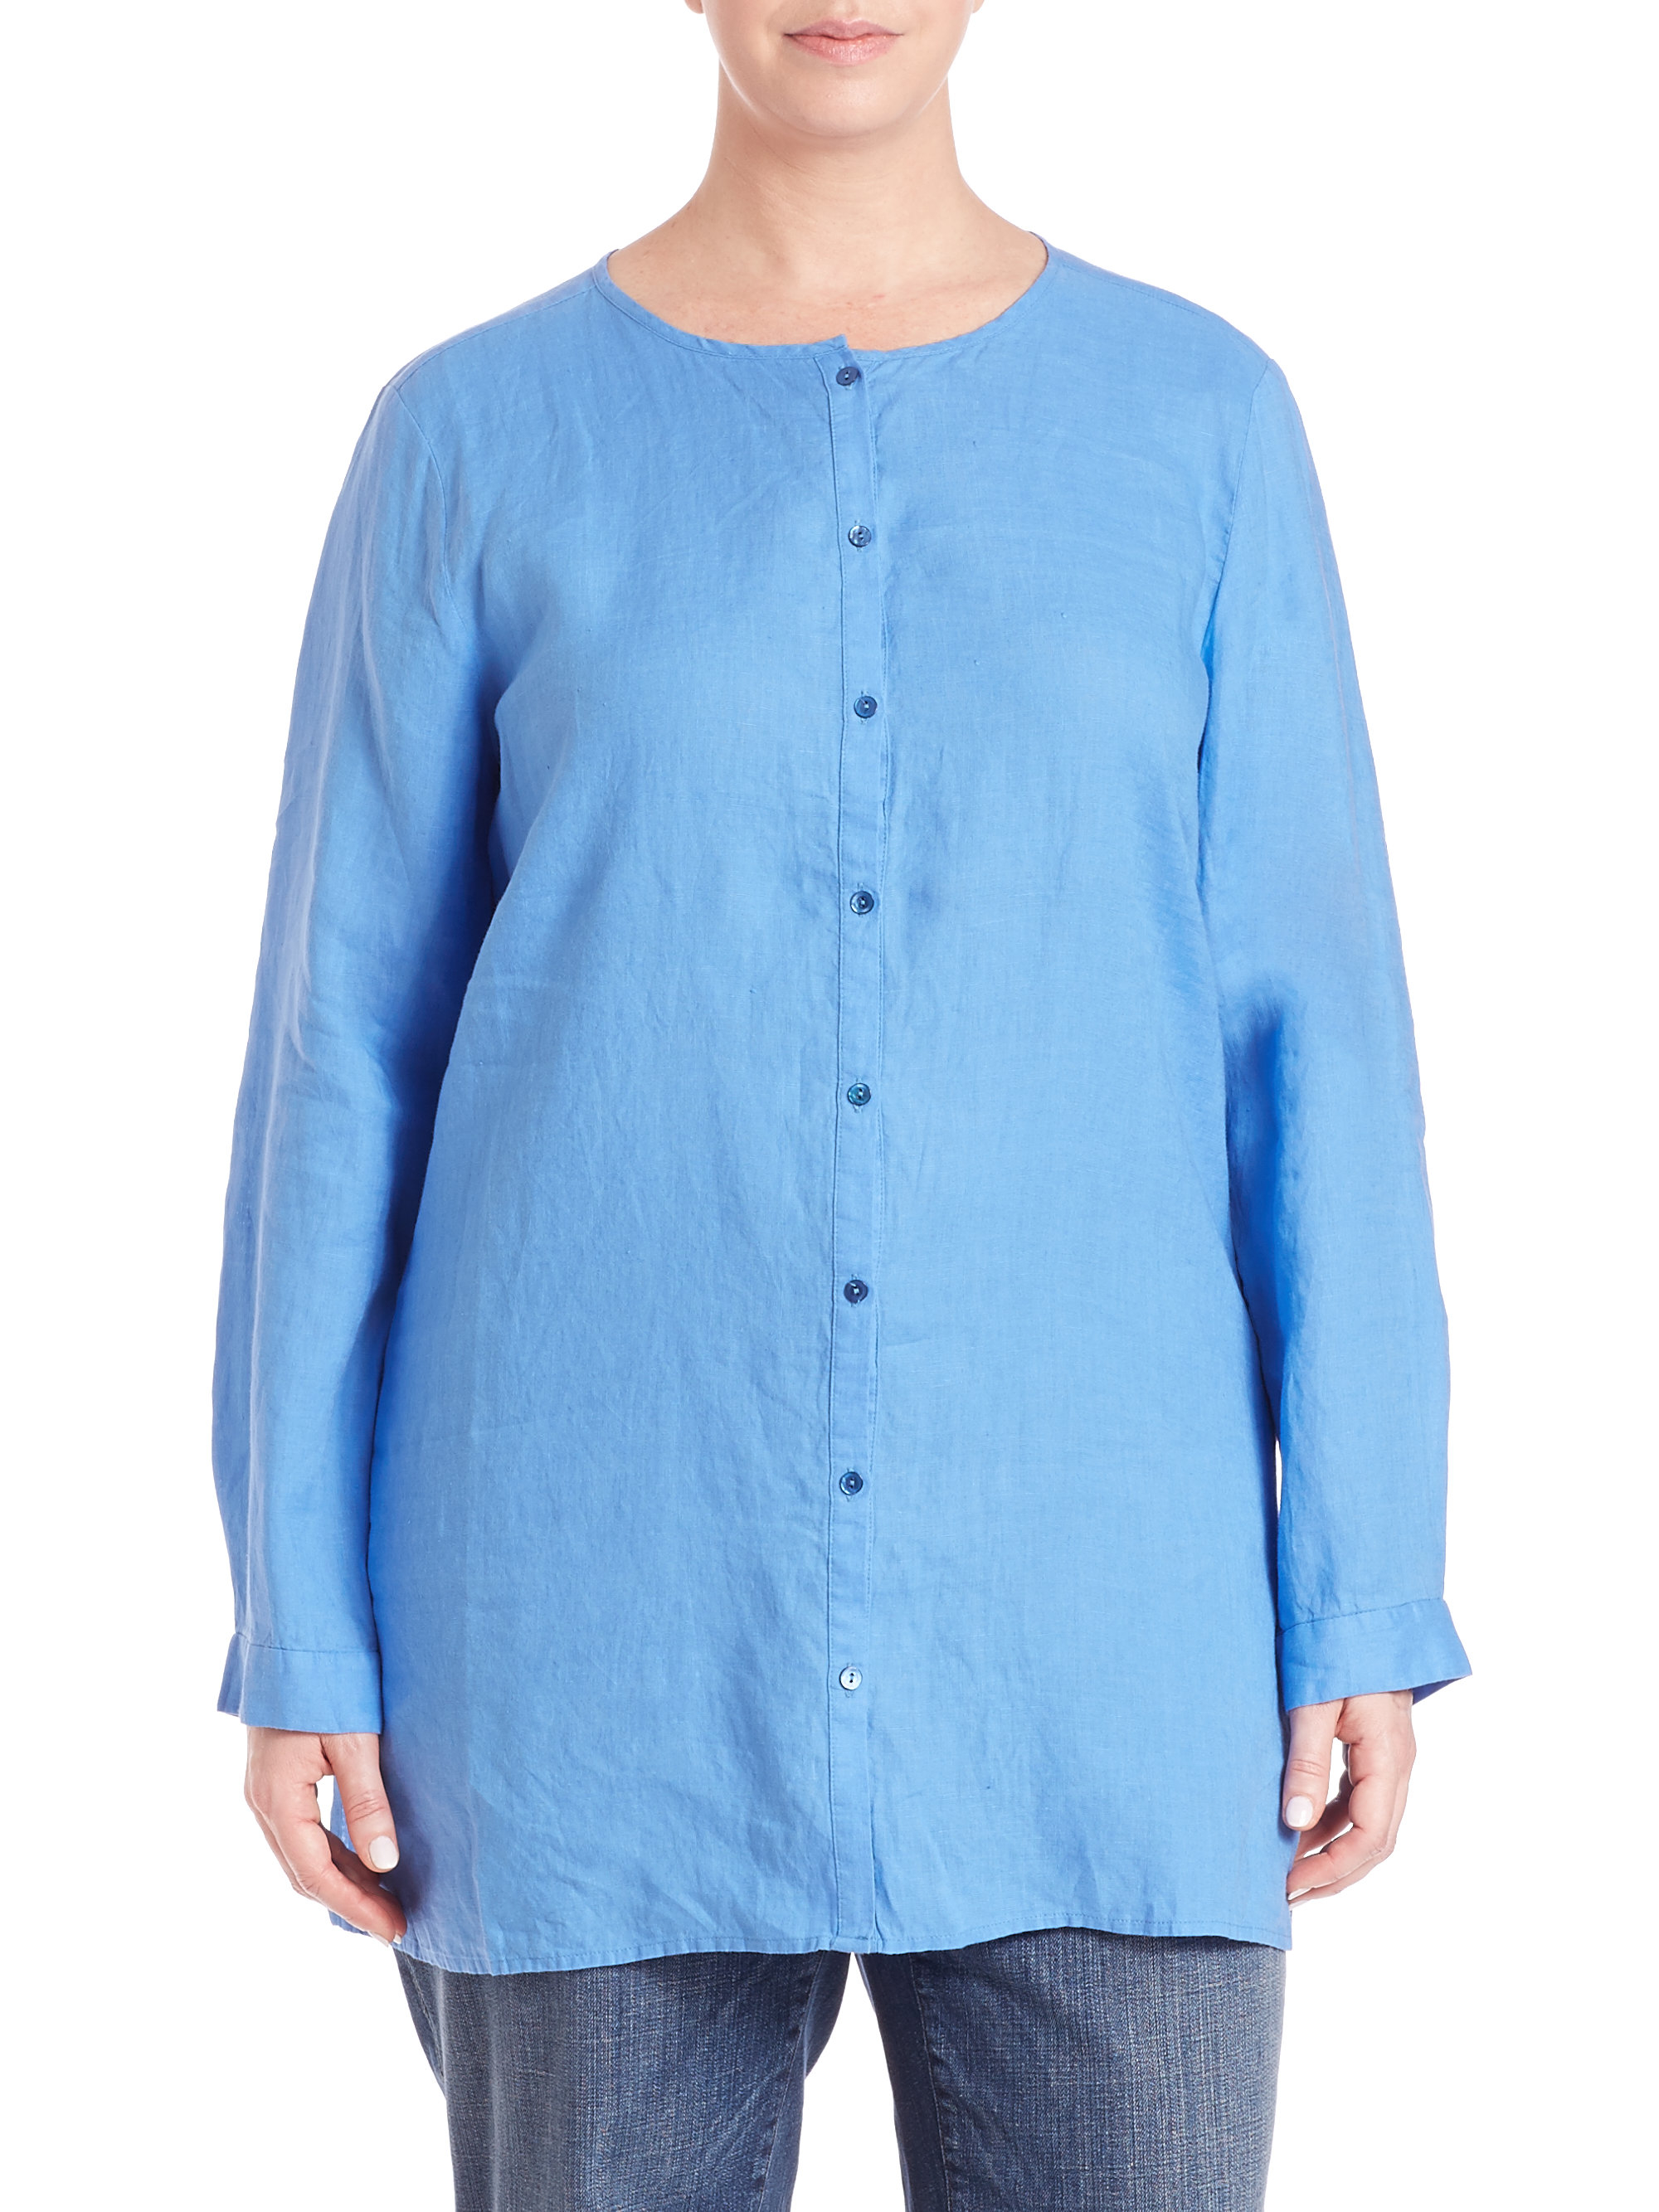 4d468f5c Eileen Fisher Organic Linen Tunic Shirt in Blue - Lyst